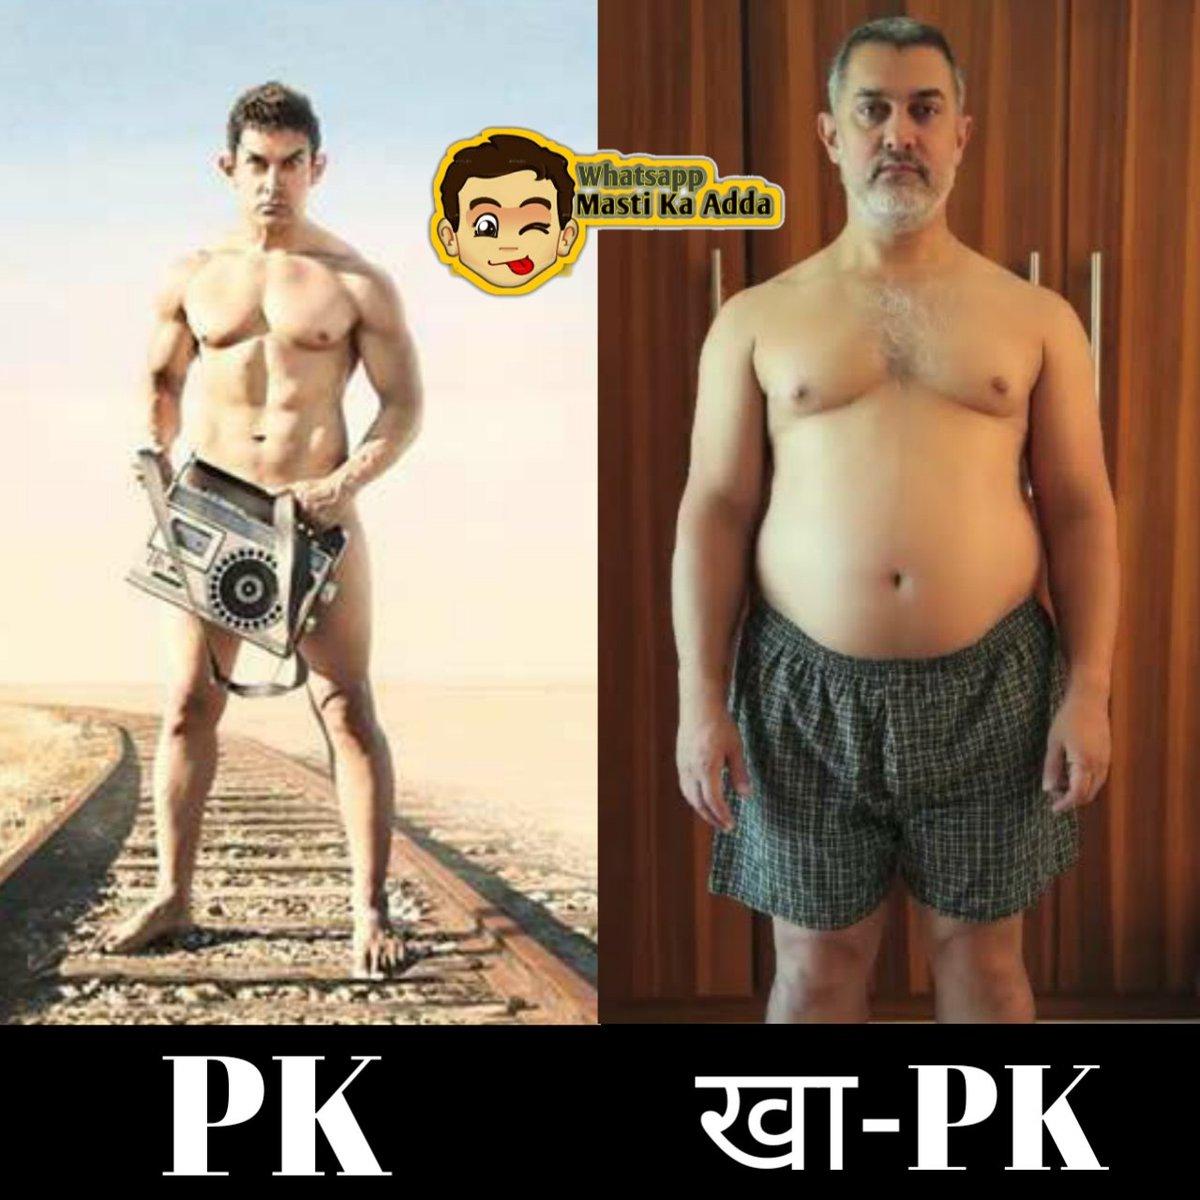 CRAZY STORIES  LIFE = MEMES  CHECKOUT AND FOLLOW#hindimemes#indianmemes #sacredgeometryart#sarcasm#bcbilli #sarcasticmemes#sarcastic#sacredmemes #sacredgames#adultmemes#trollsparty #memesdaily#bakchodiyaan#bakchod_nation #logictrendz#hindimemespic.twitter.com/xcaCTc7RZ7